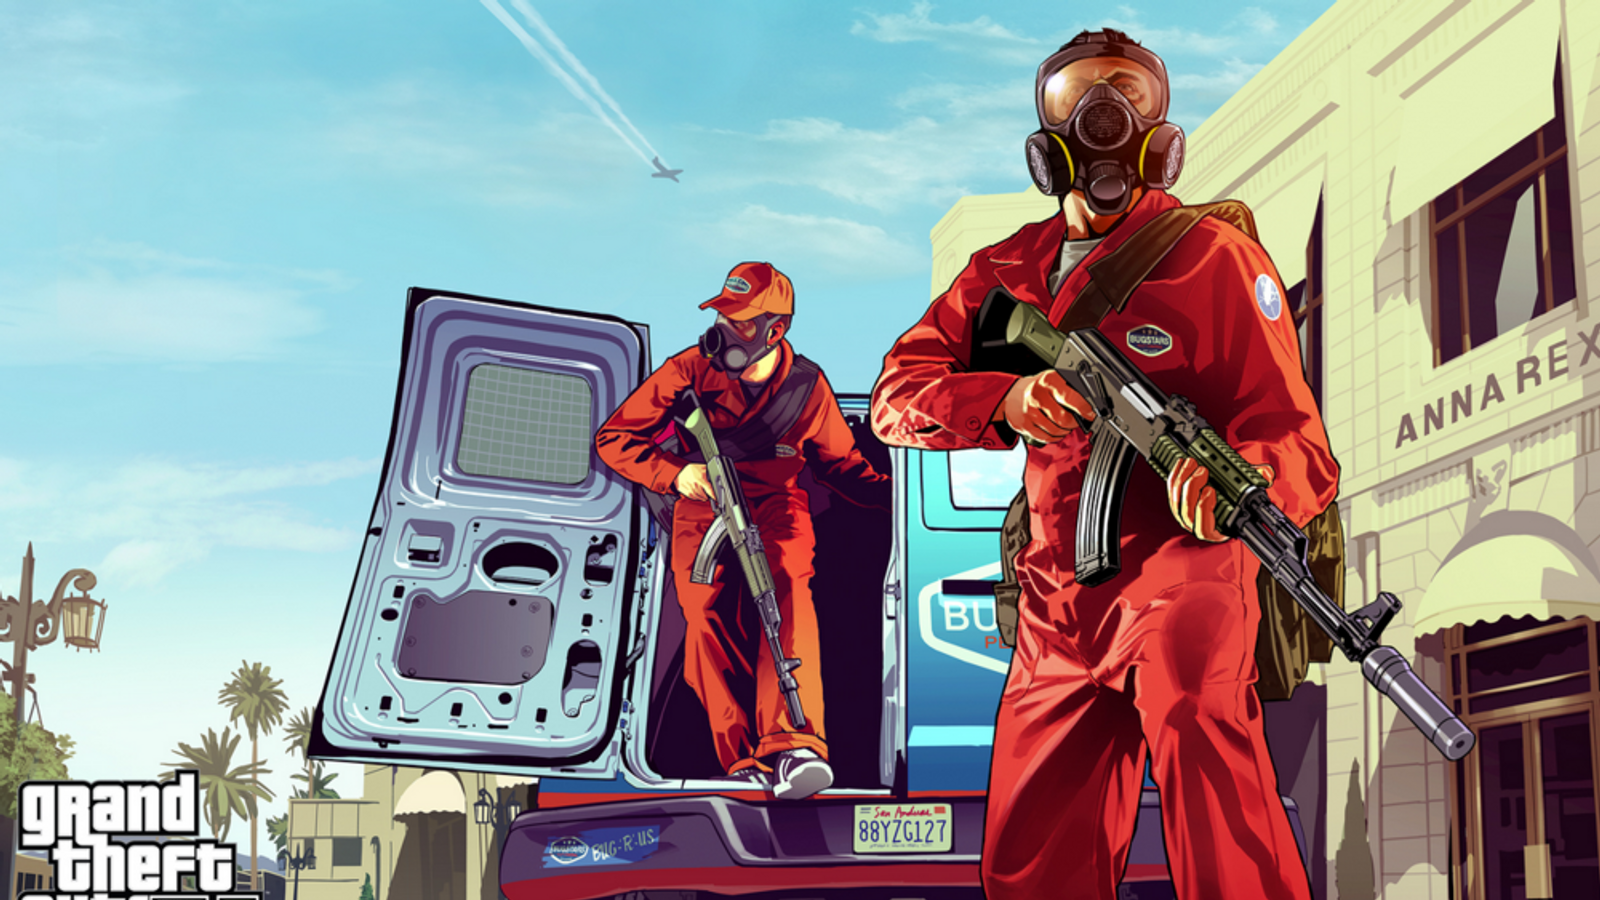 Grand Theft Auto V launch